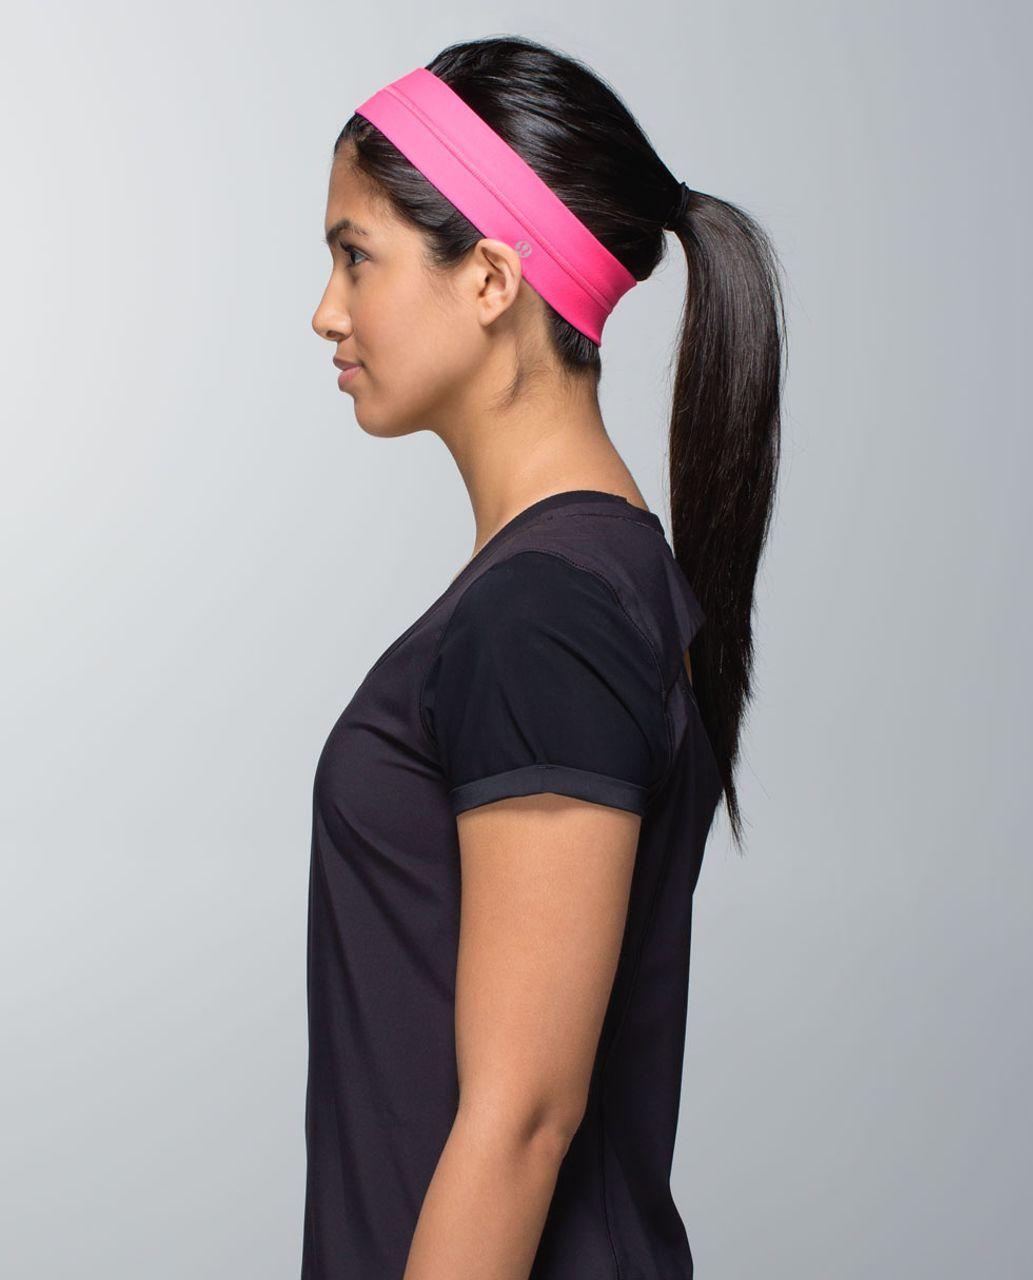 Lululemon Fly Away Tamer Headband - Pow Pink Light